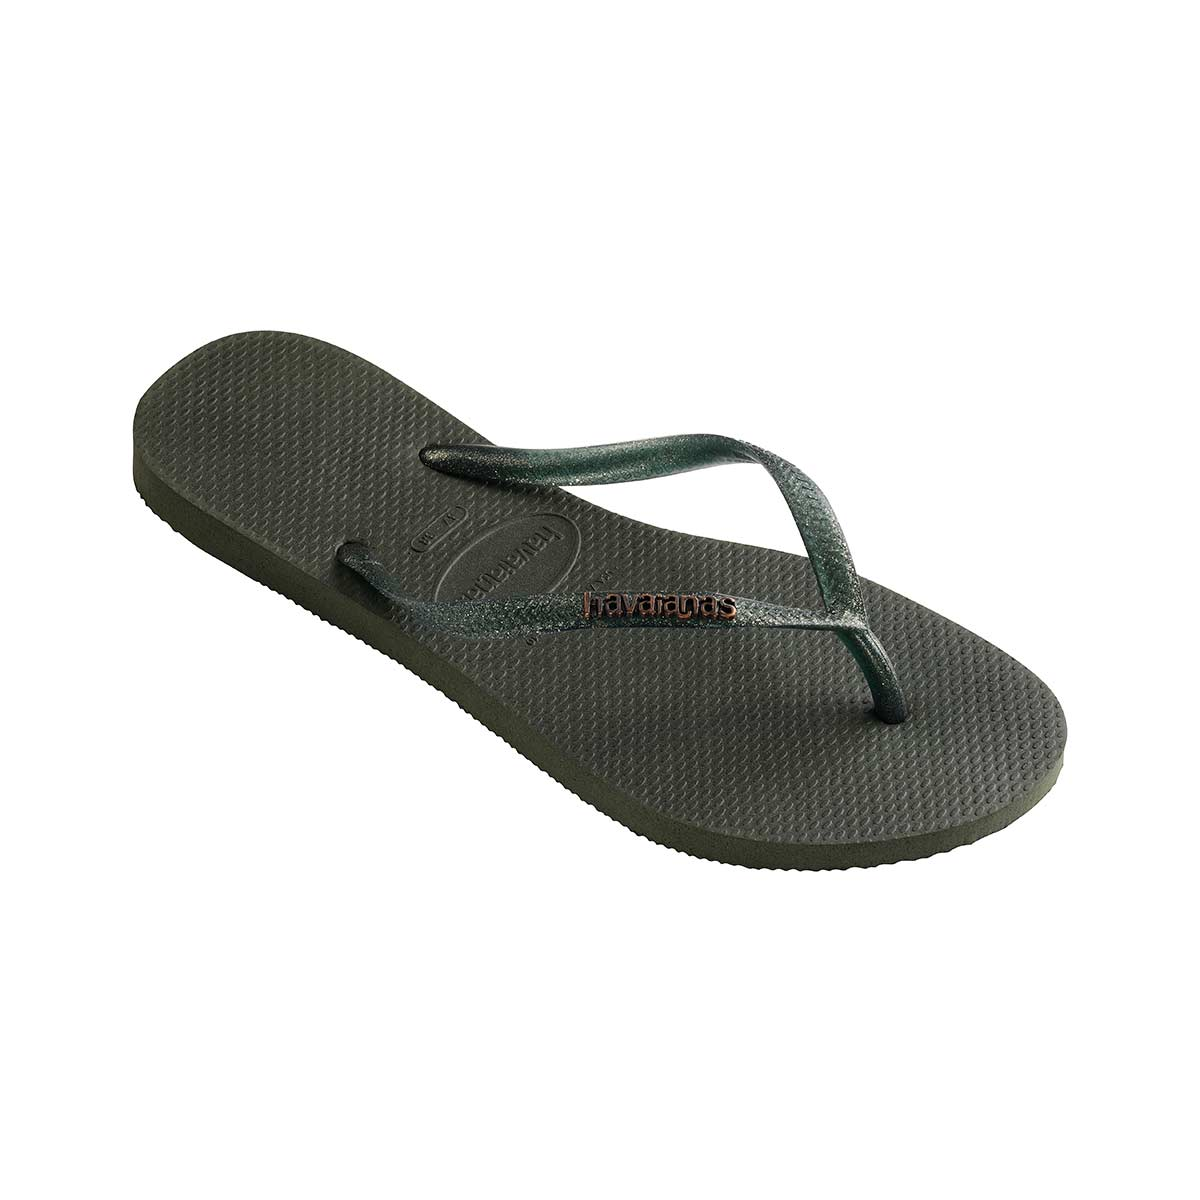 8a77c6283cb Tongs vert kaki Slim Logo Metallic - Havaianas Accessoires Sun